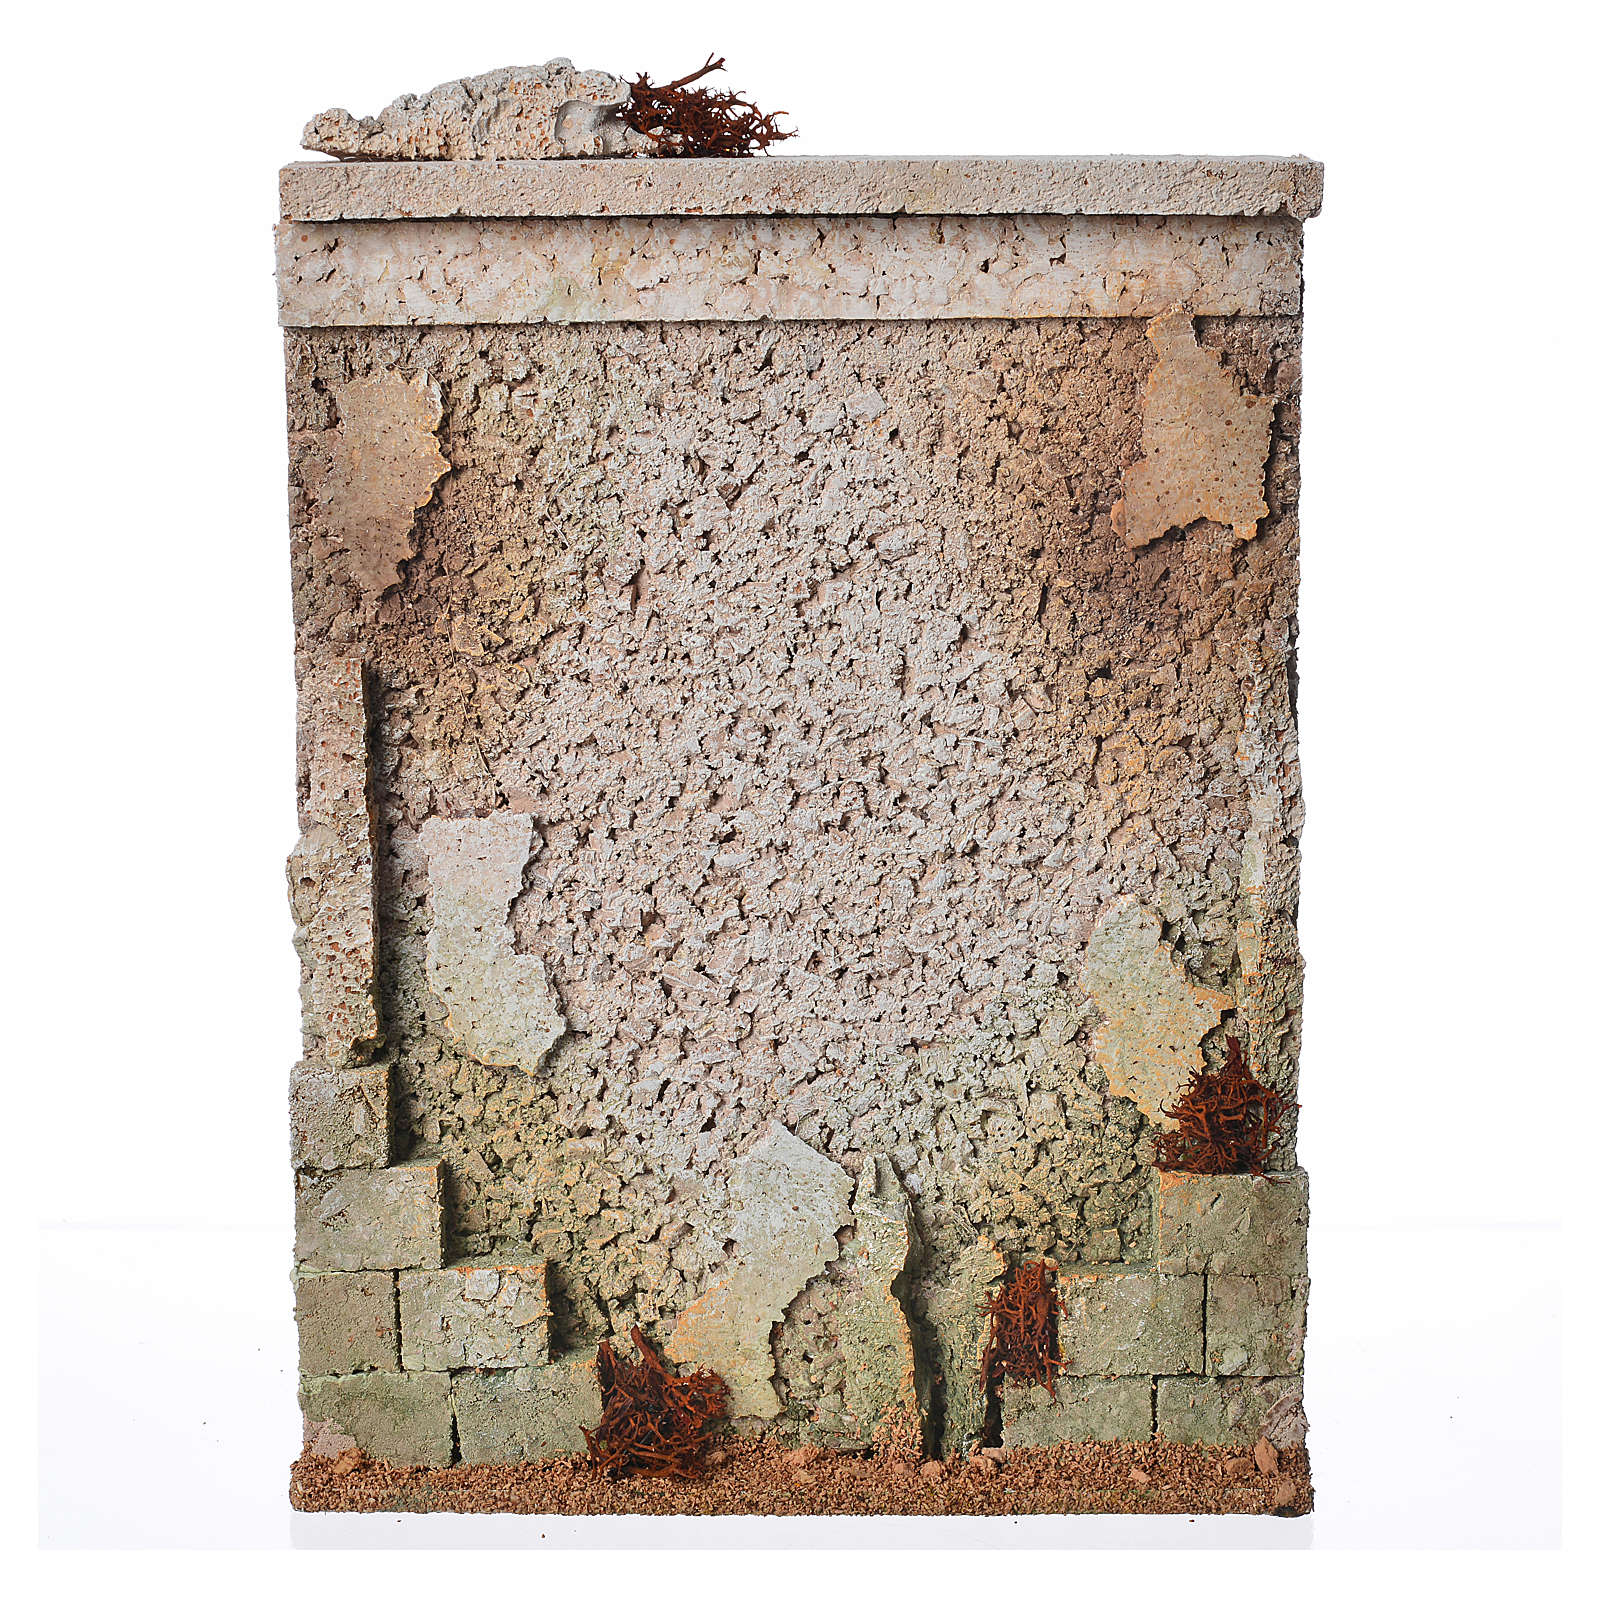 Muro di cinta presepe in sughero 4